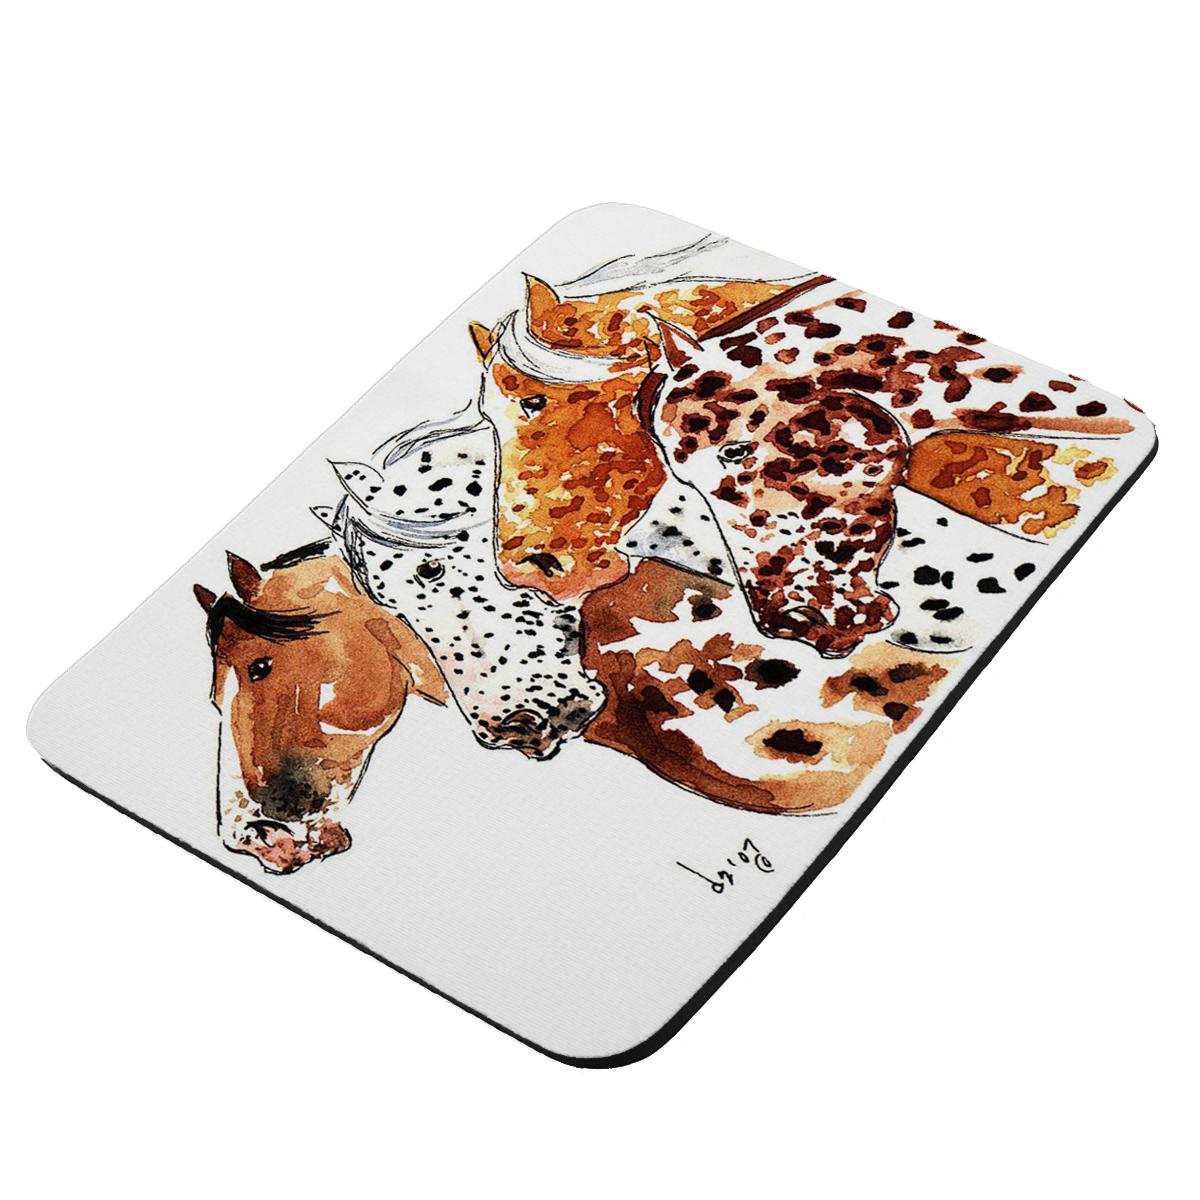 Four Appaloosa Horses Equine Art by Denise Every - KuzmarK Mousepad / Hot Pad / Trivet